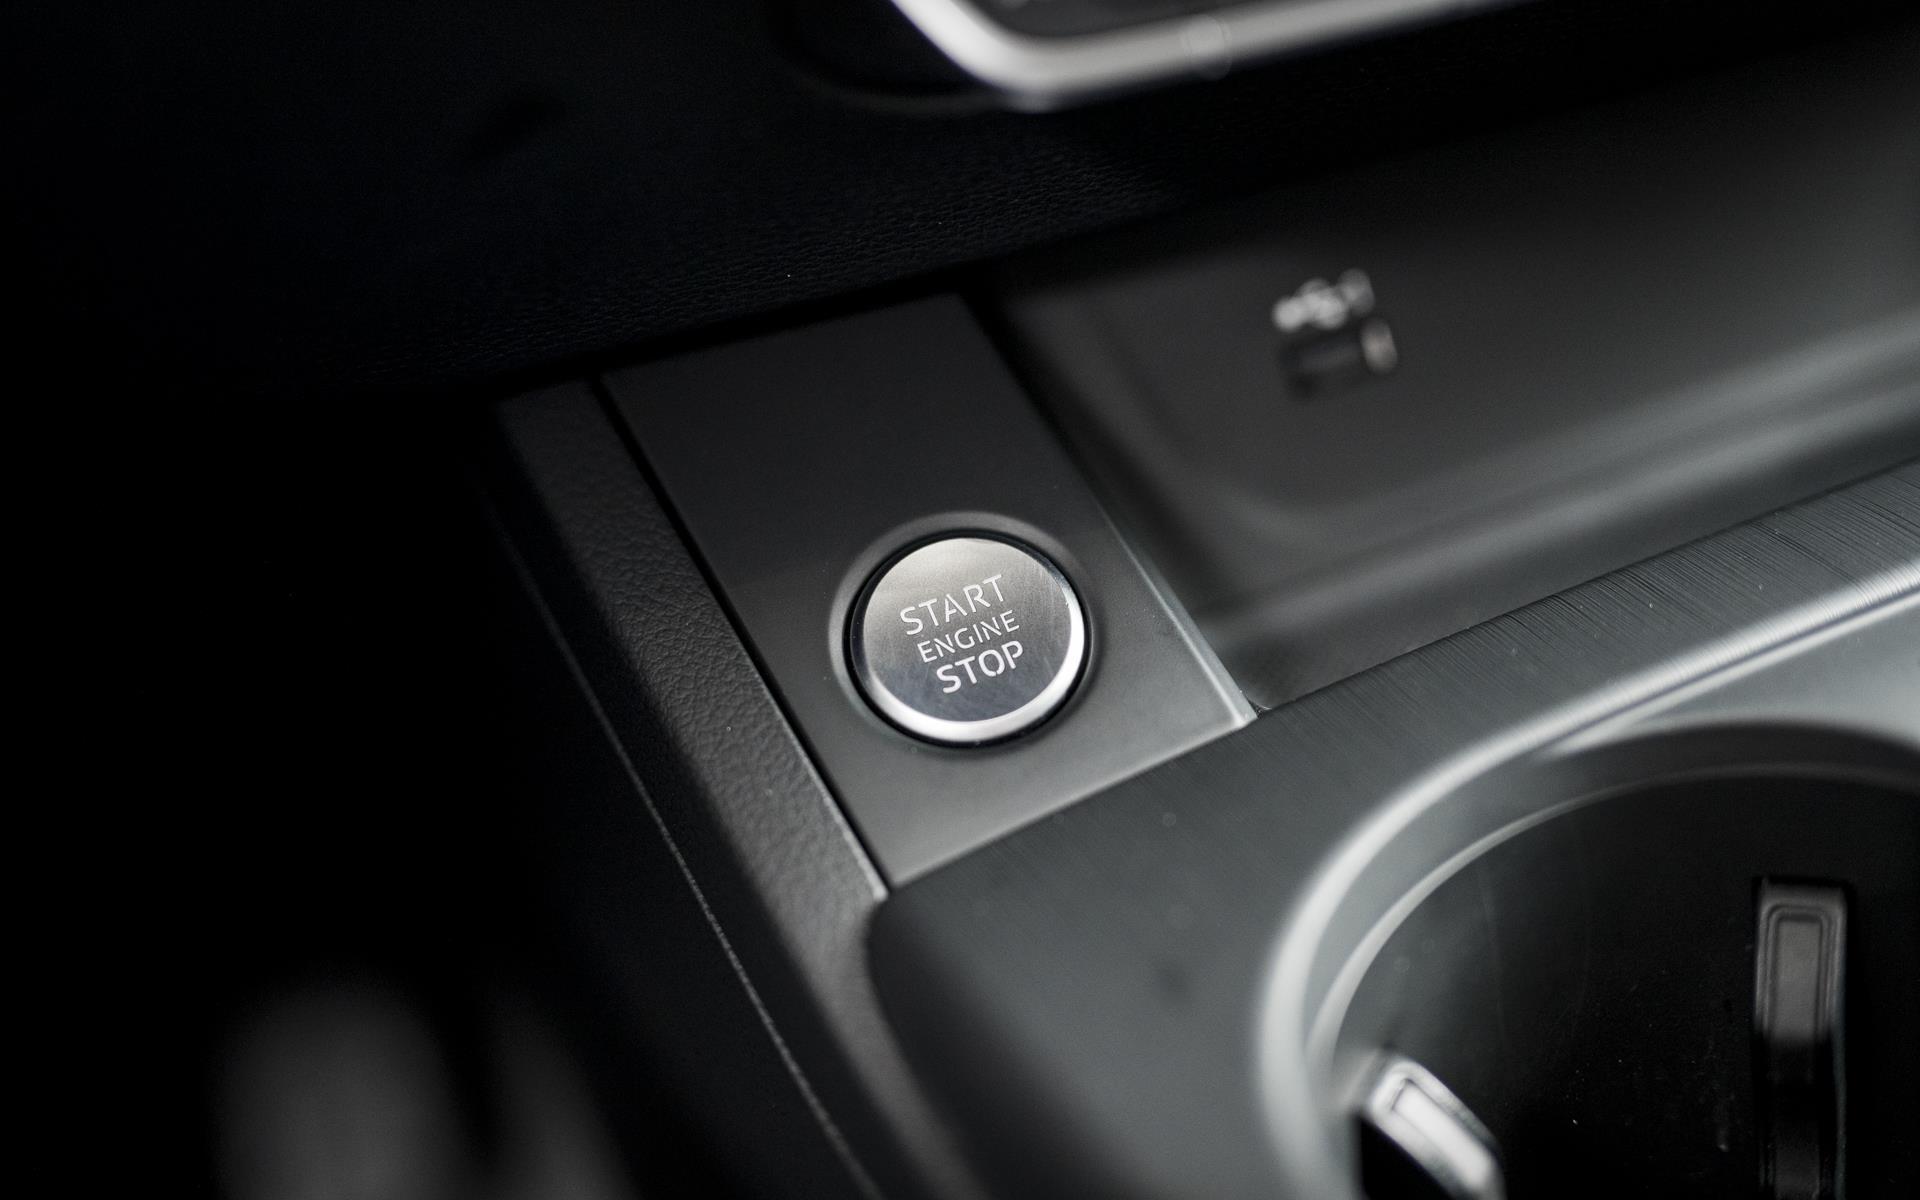 40 Avant 2,0 TDI Quattro S-Tronic 190HK Stc  image11